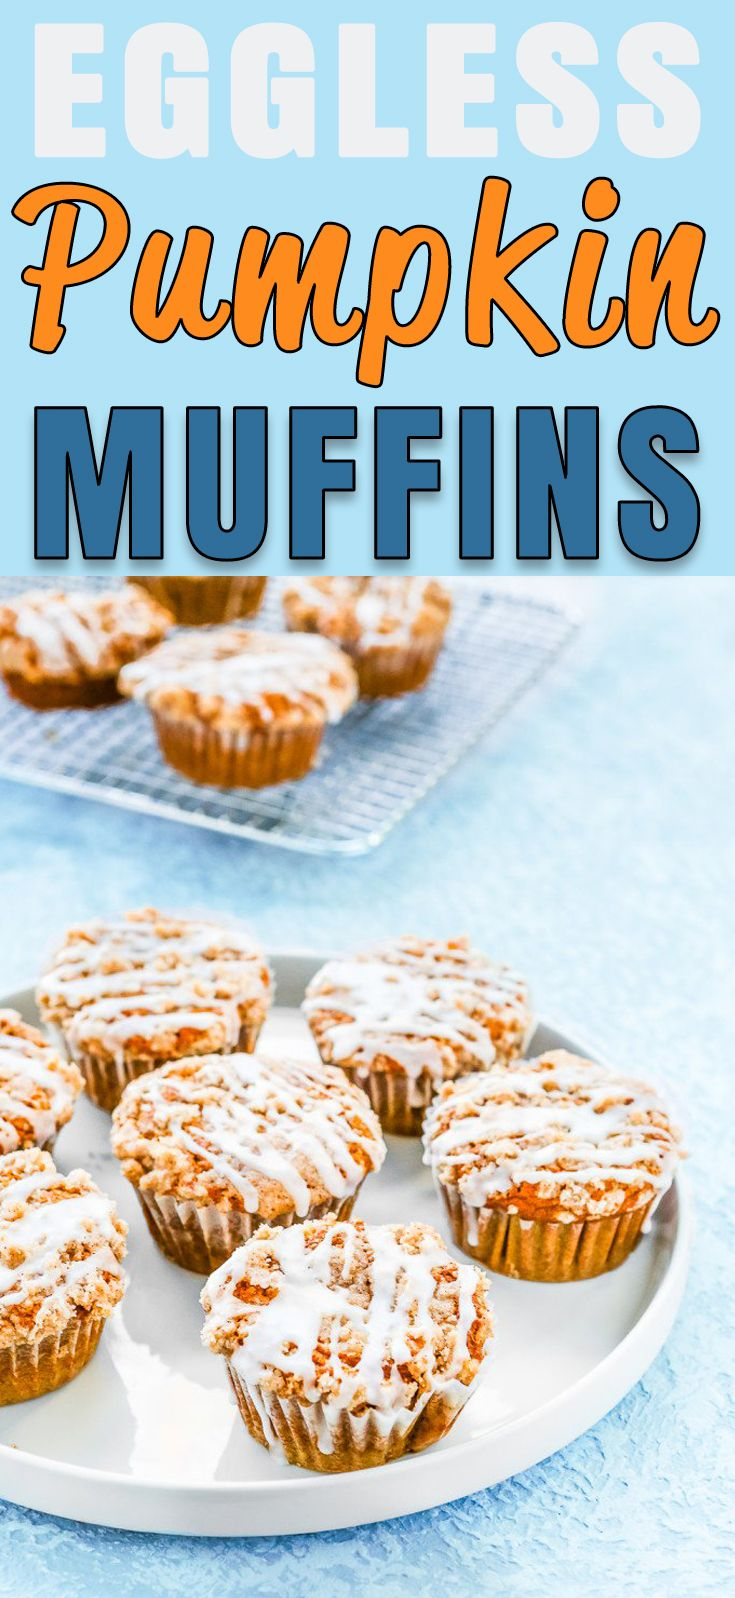 Eggless Pumpkin Muffins #pumpkinmuffins